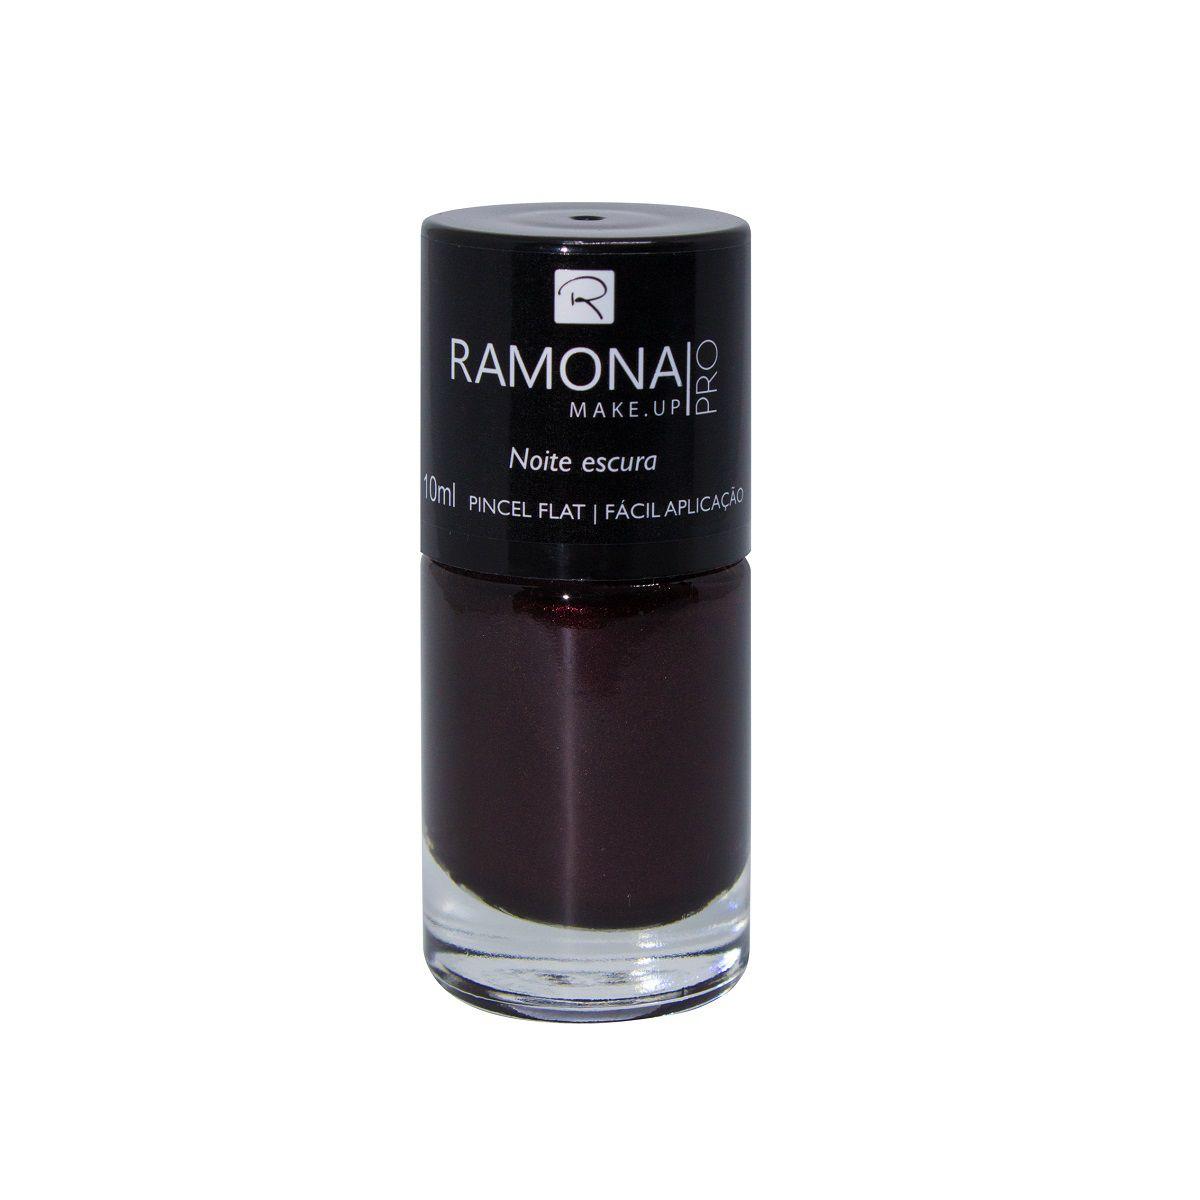 Esmalte cintilante Ramona Cosméticos Noite escura 10ml